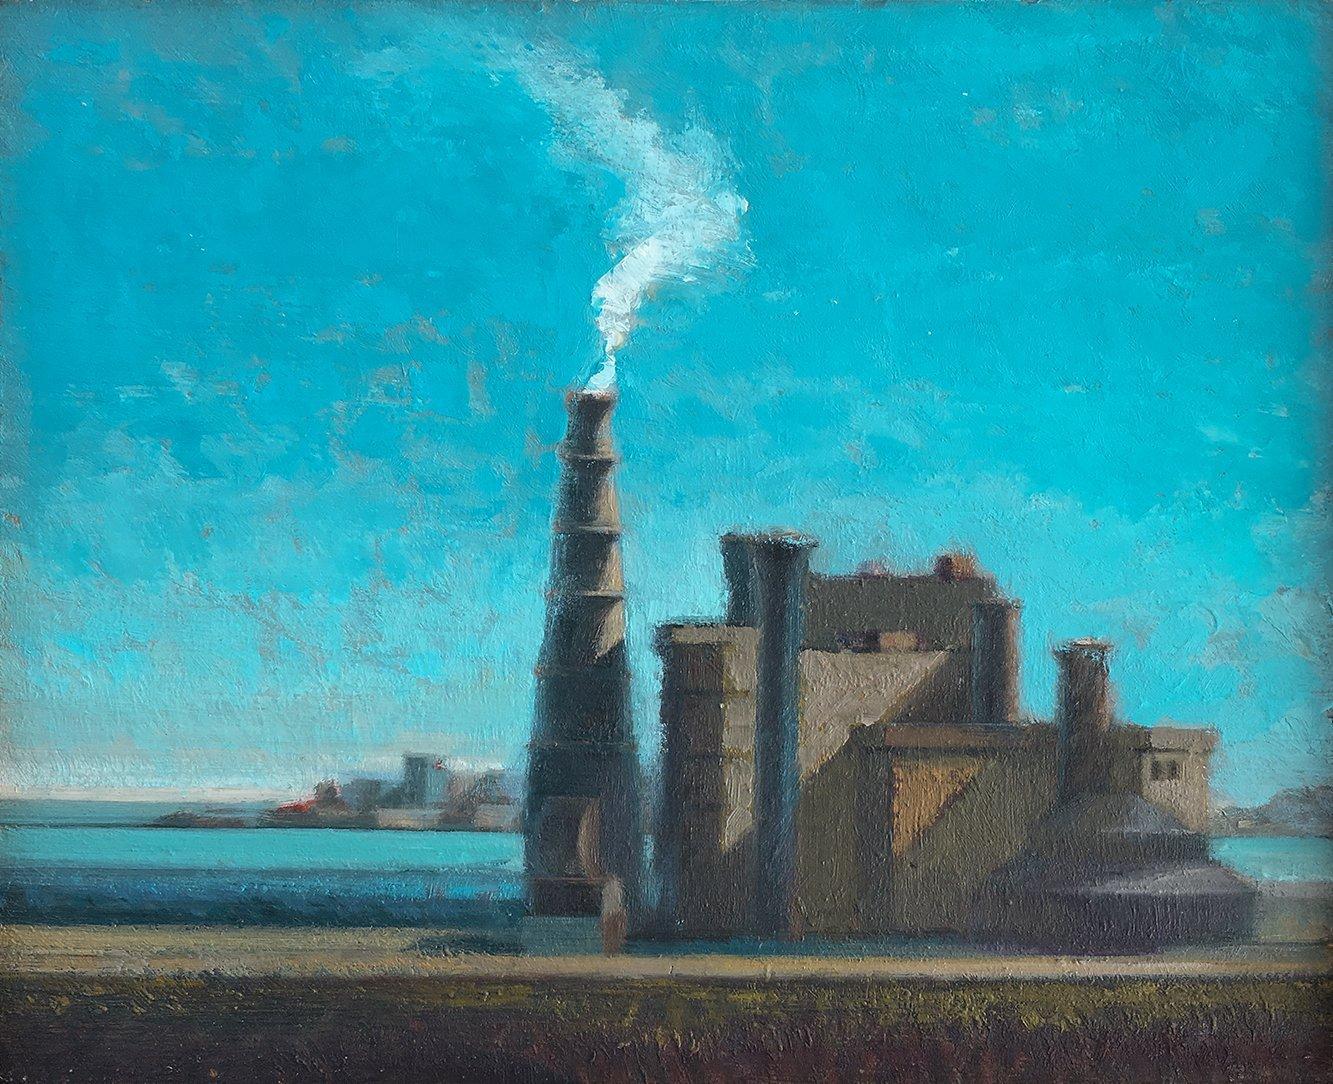 Patrick Dullanty, Bay Power Station, 1970